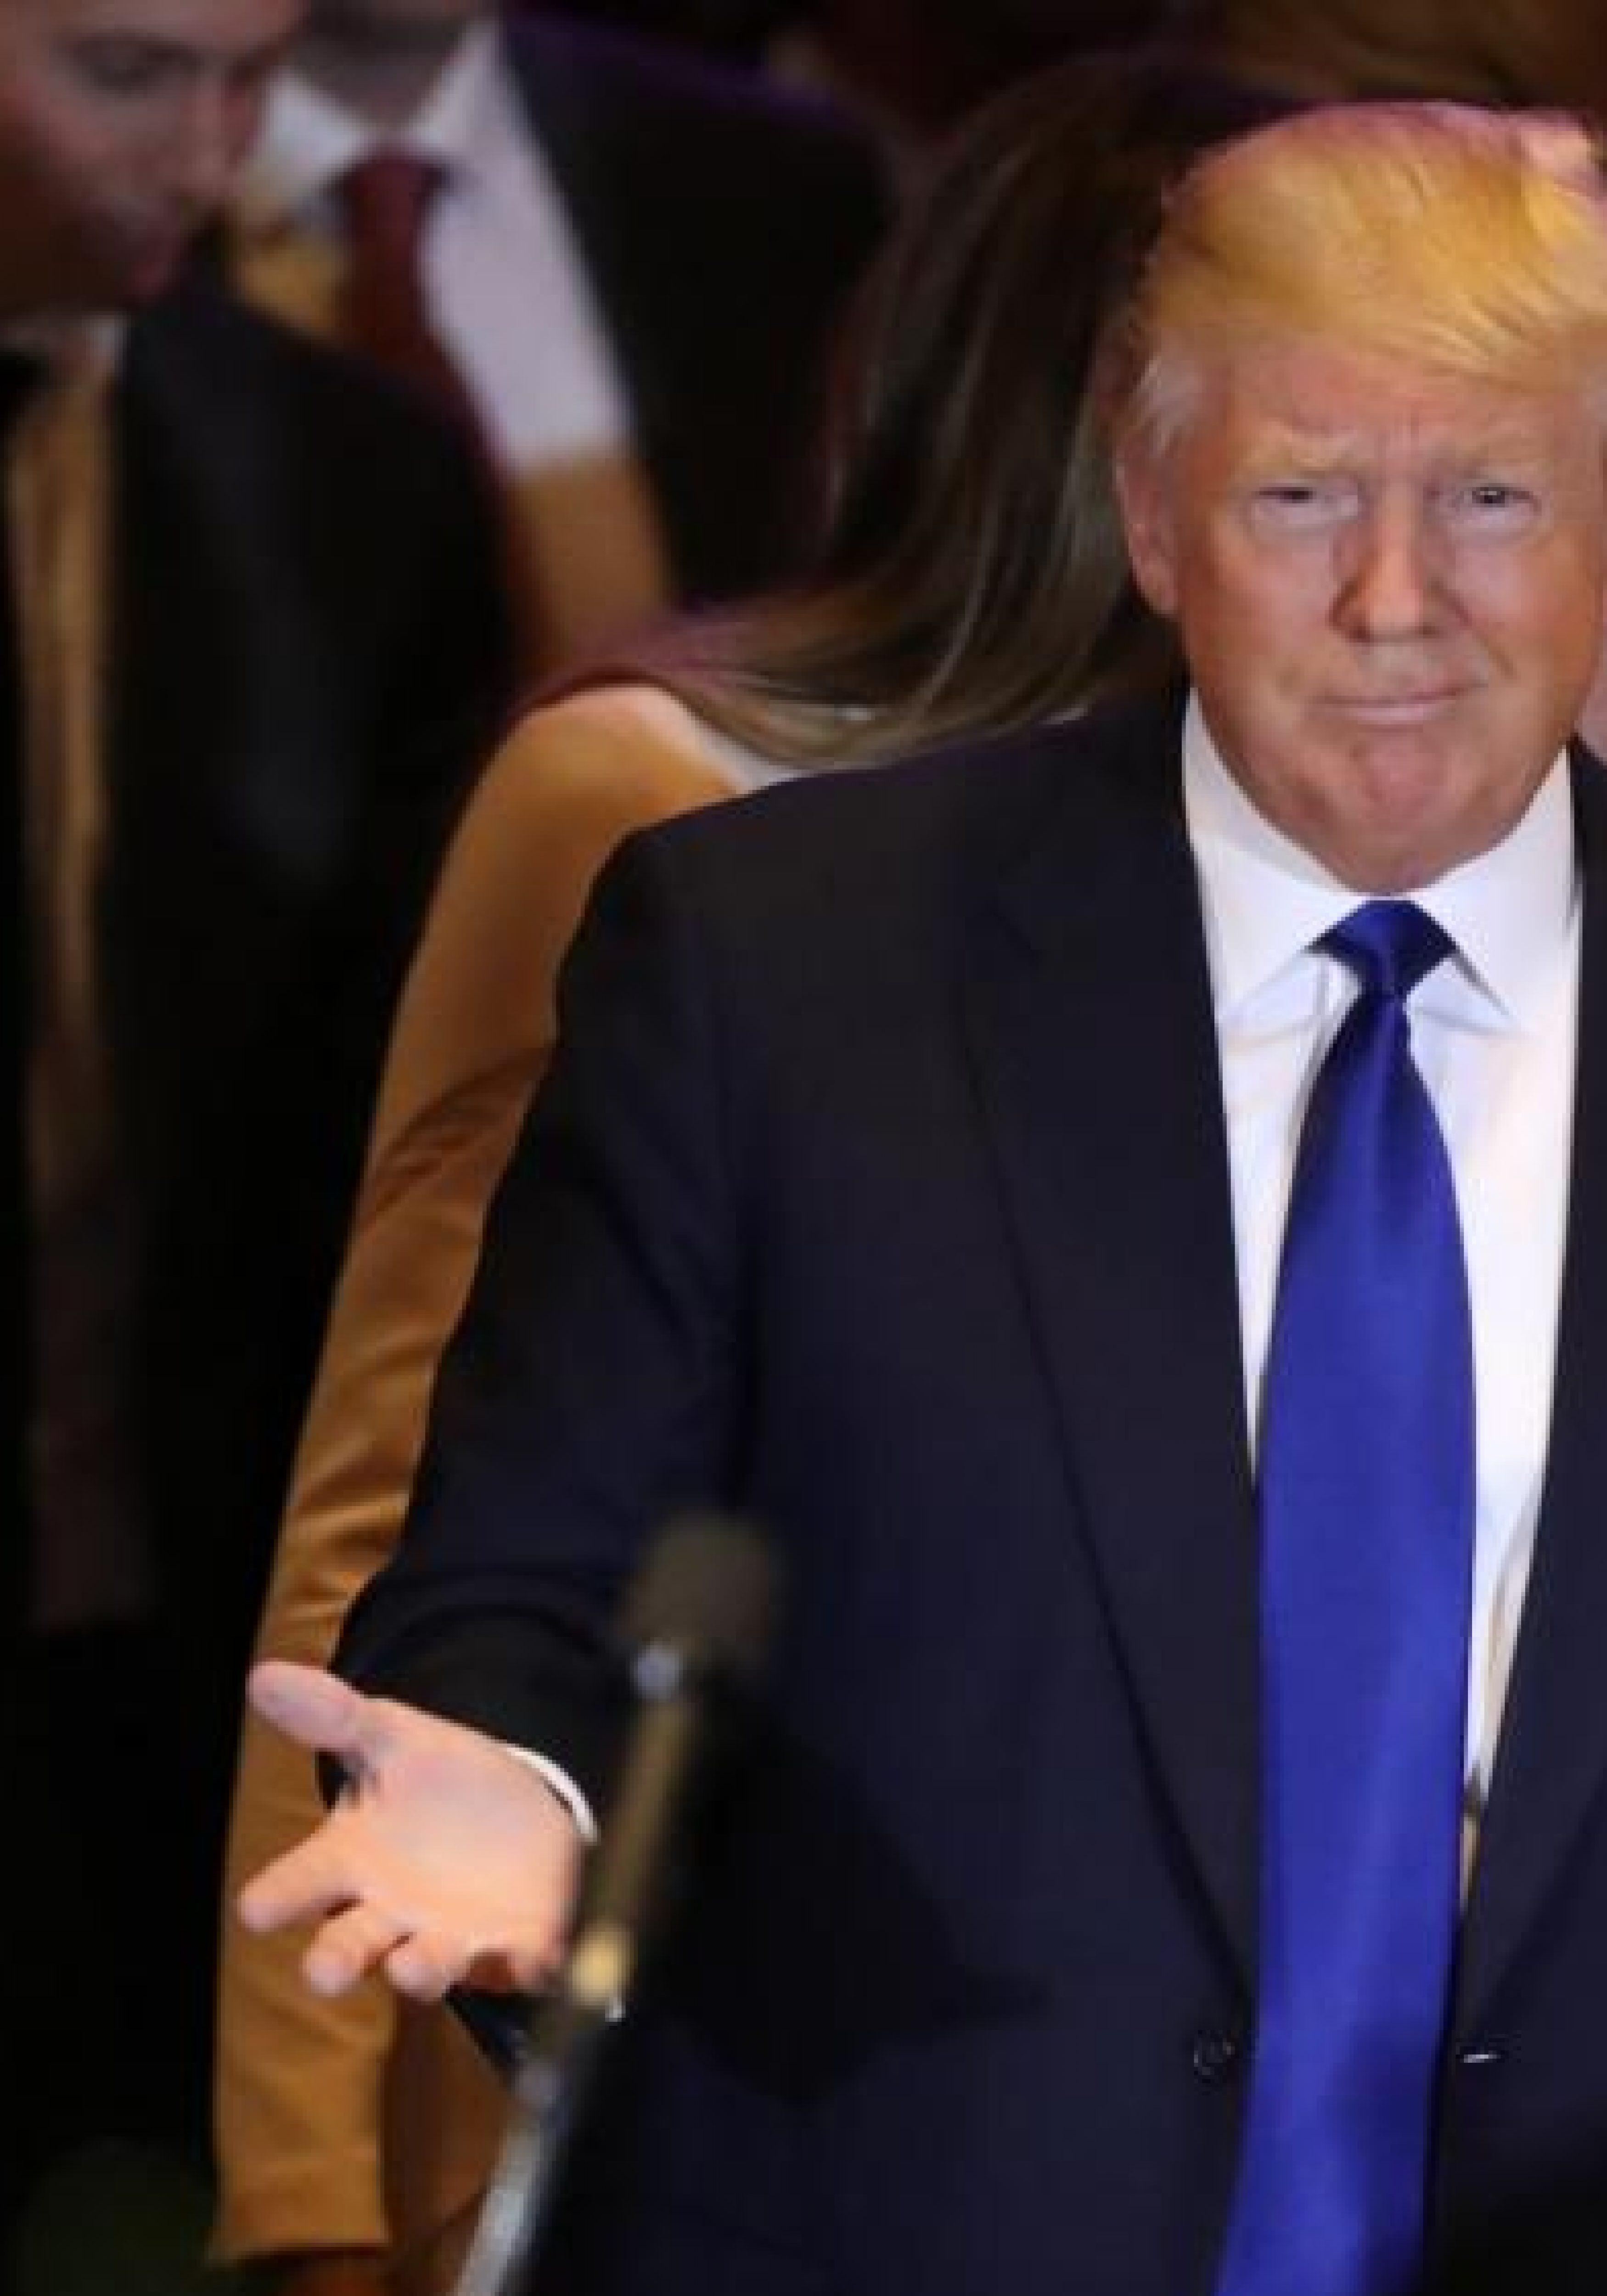 Donald-Trump-wins-Indiana-e1462317228968-3500x5000.jpg